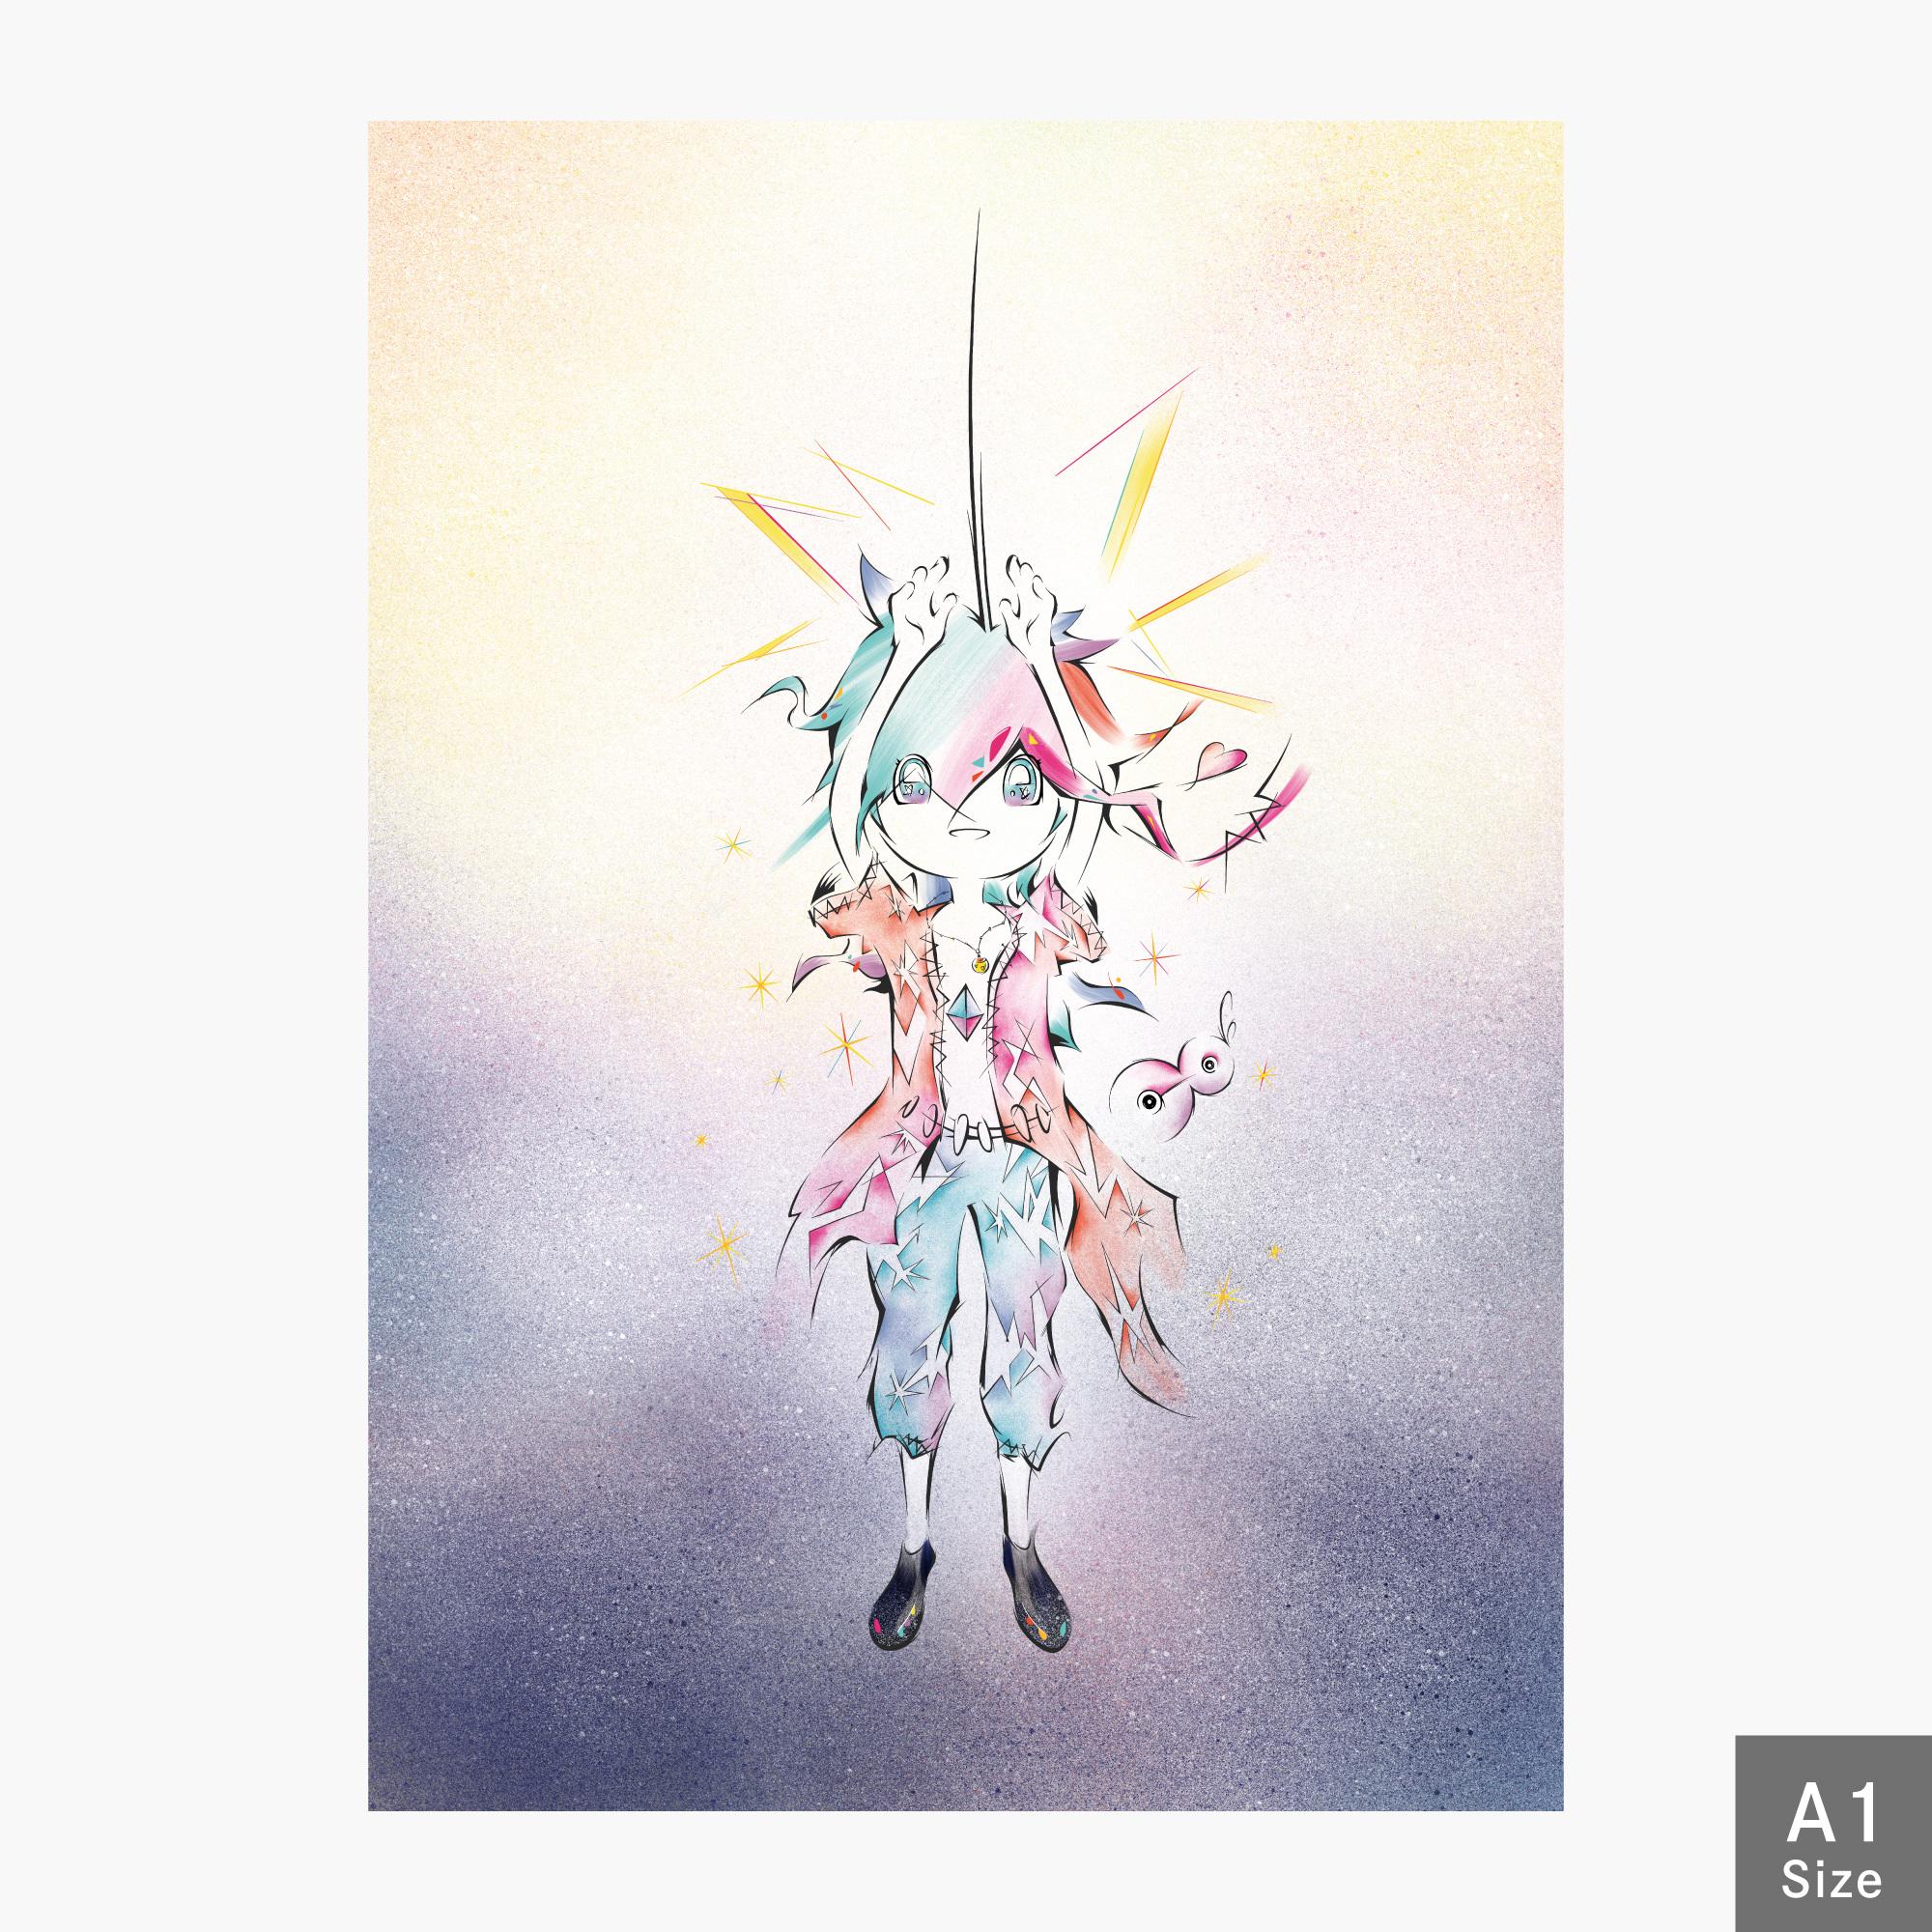 【A1 ジークレー版画】 心の声に意識を集中 【受注生産】